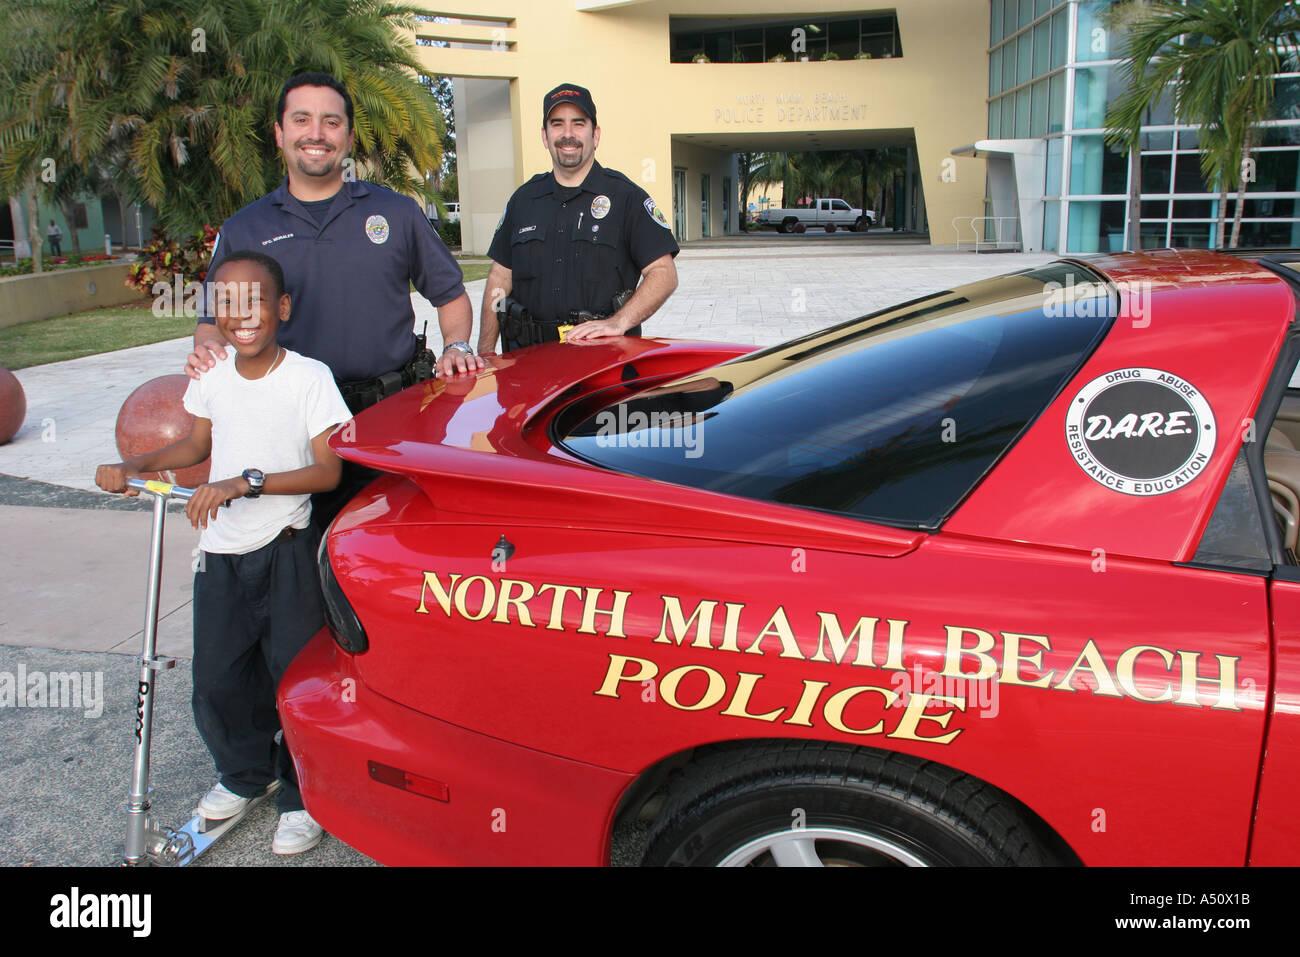 North Miami Beach Florida Police Department DARE Anti Drug Promotion Red  Sports Car Black Male Boy